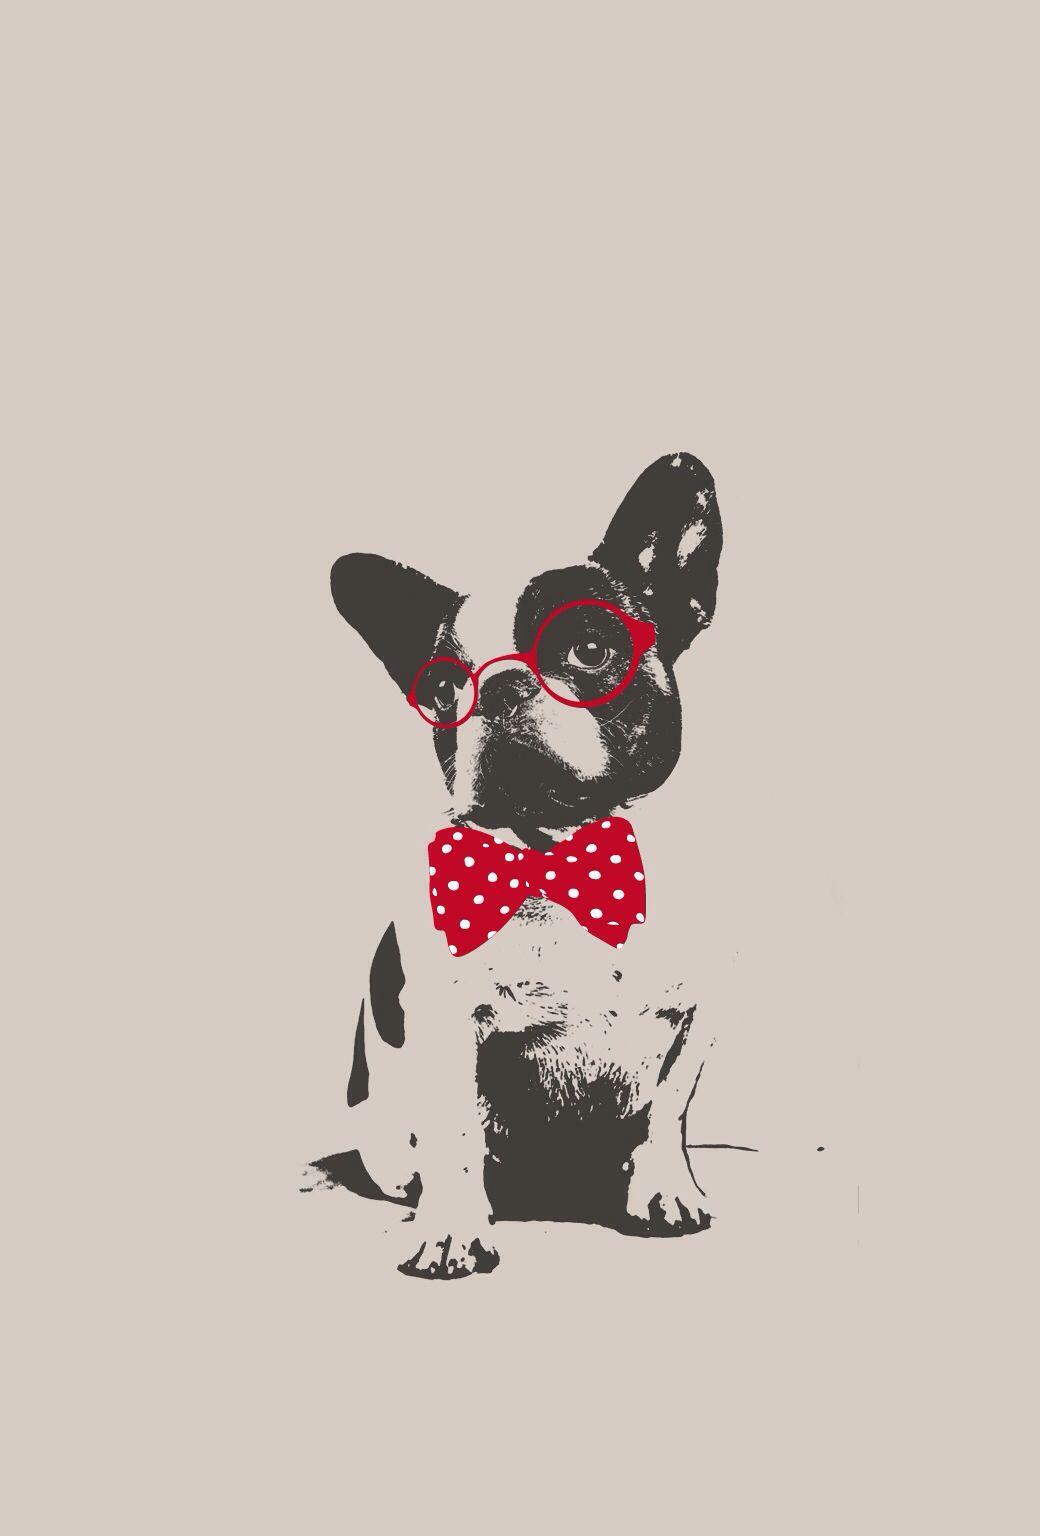 Bulldog Iphone 5 Dog Wallpaper Iphone Dog Wallpaper French